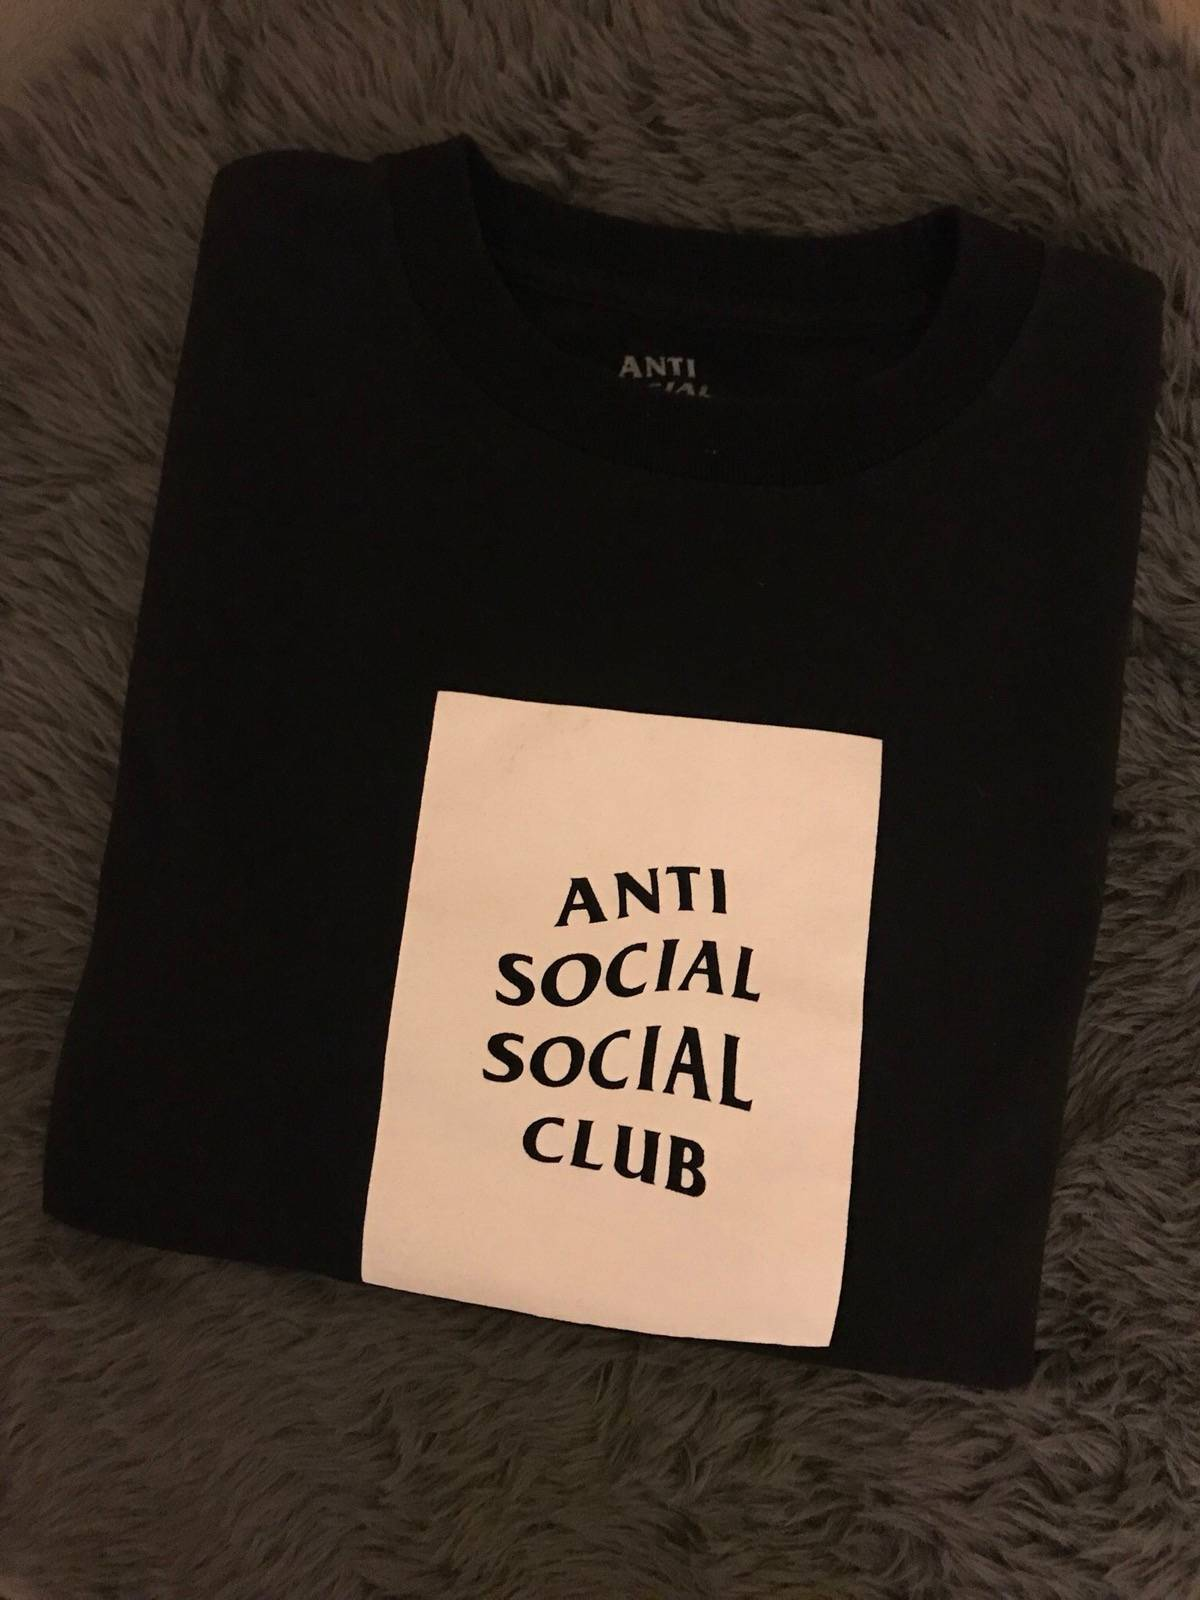 6e203104 Anti Social Social Club Antisocial Social Club Suhi Tee Size S | Grailed